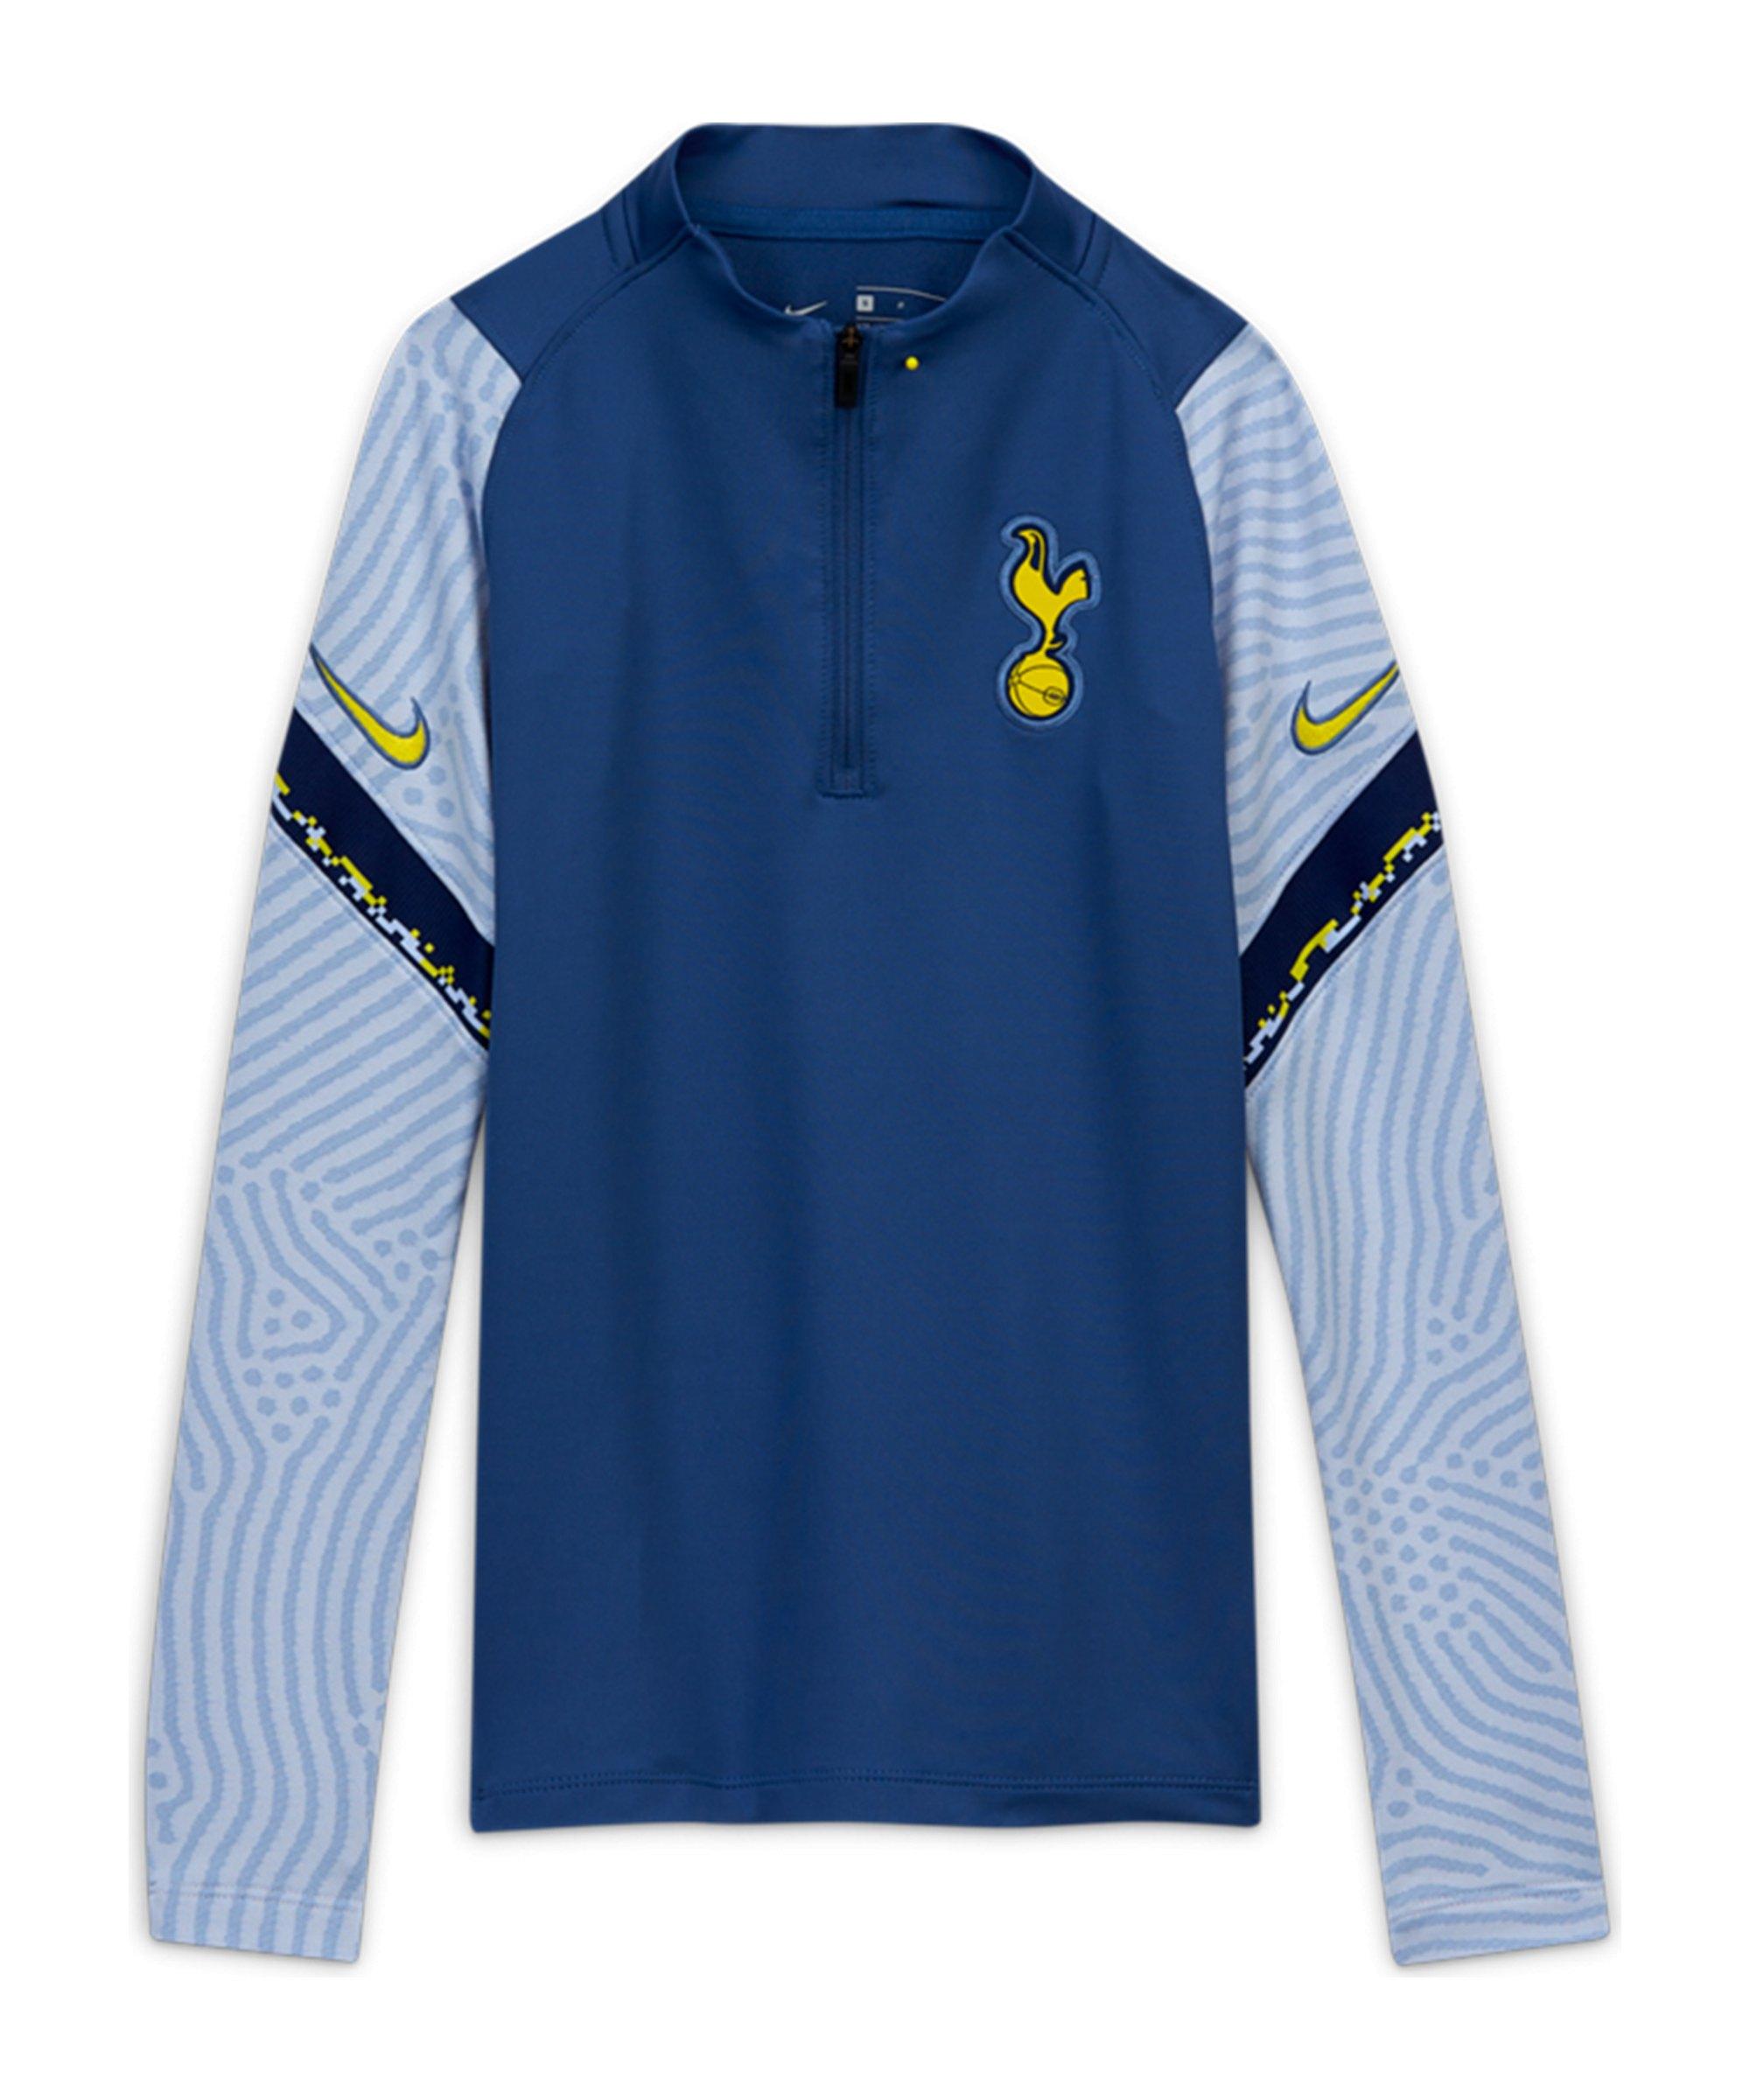 Nike Tottenham Hotspur Dry Strike Drill Top CL Kids Blau F469 - blau